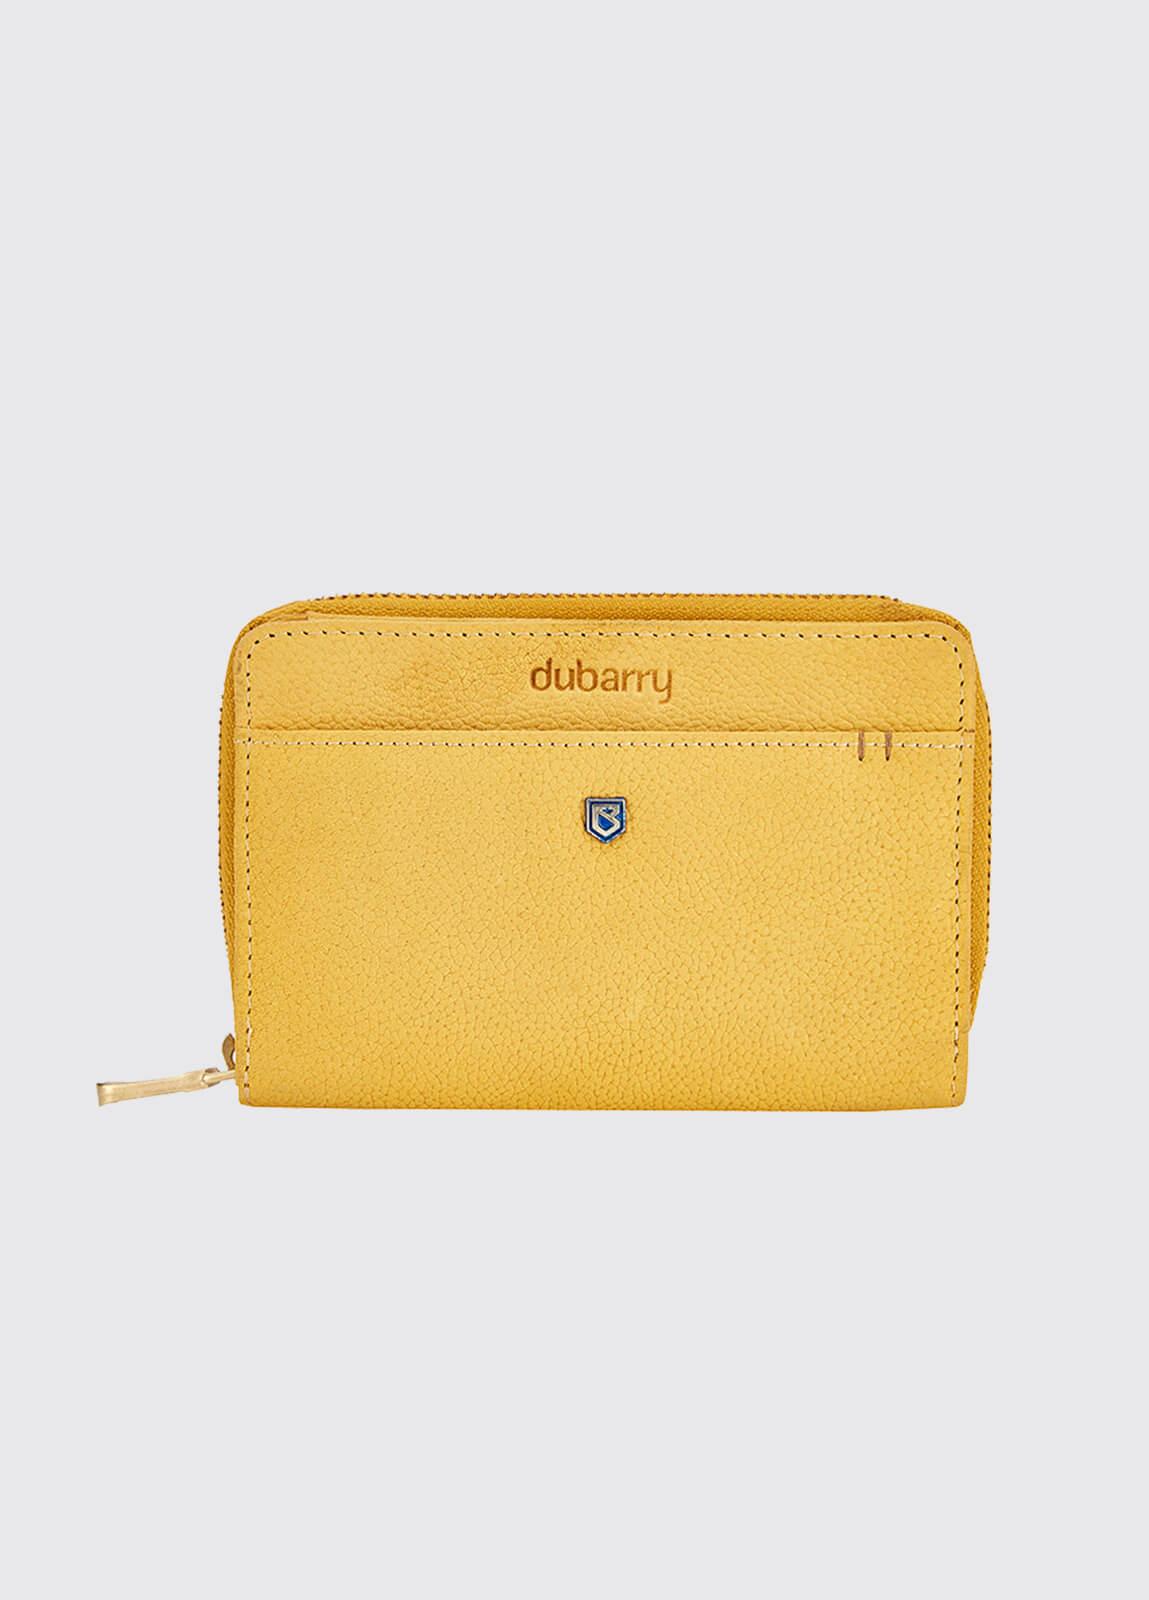 Portrush Leather Wallet - Sunflower